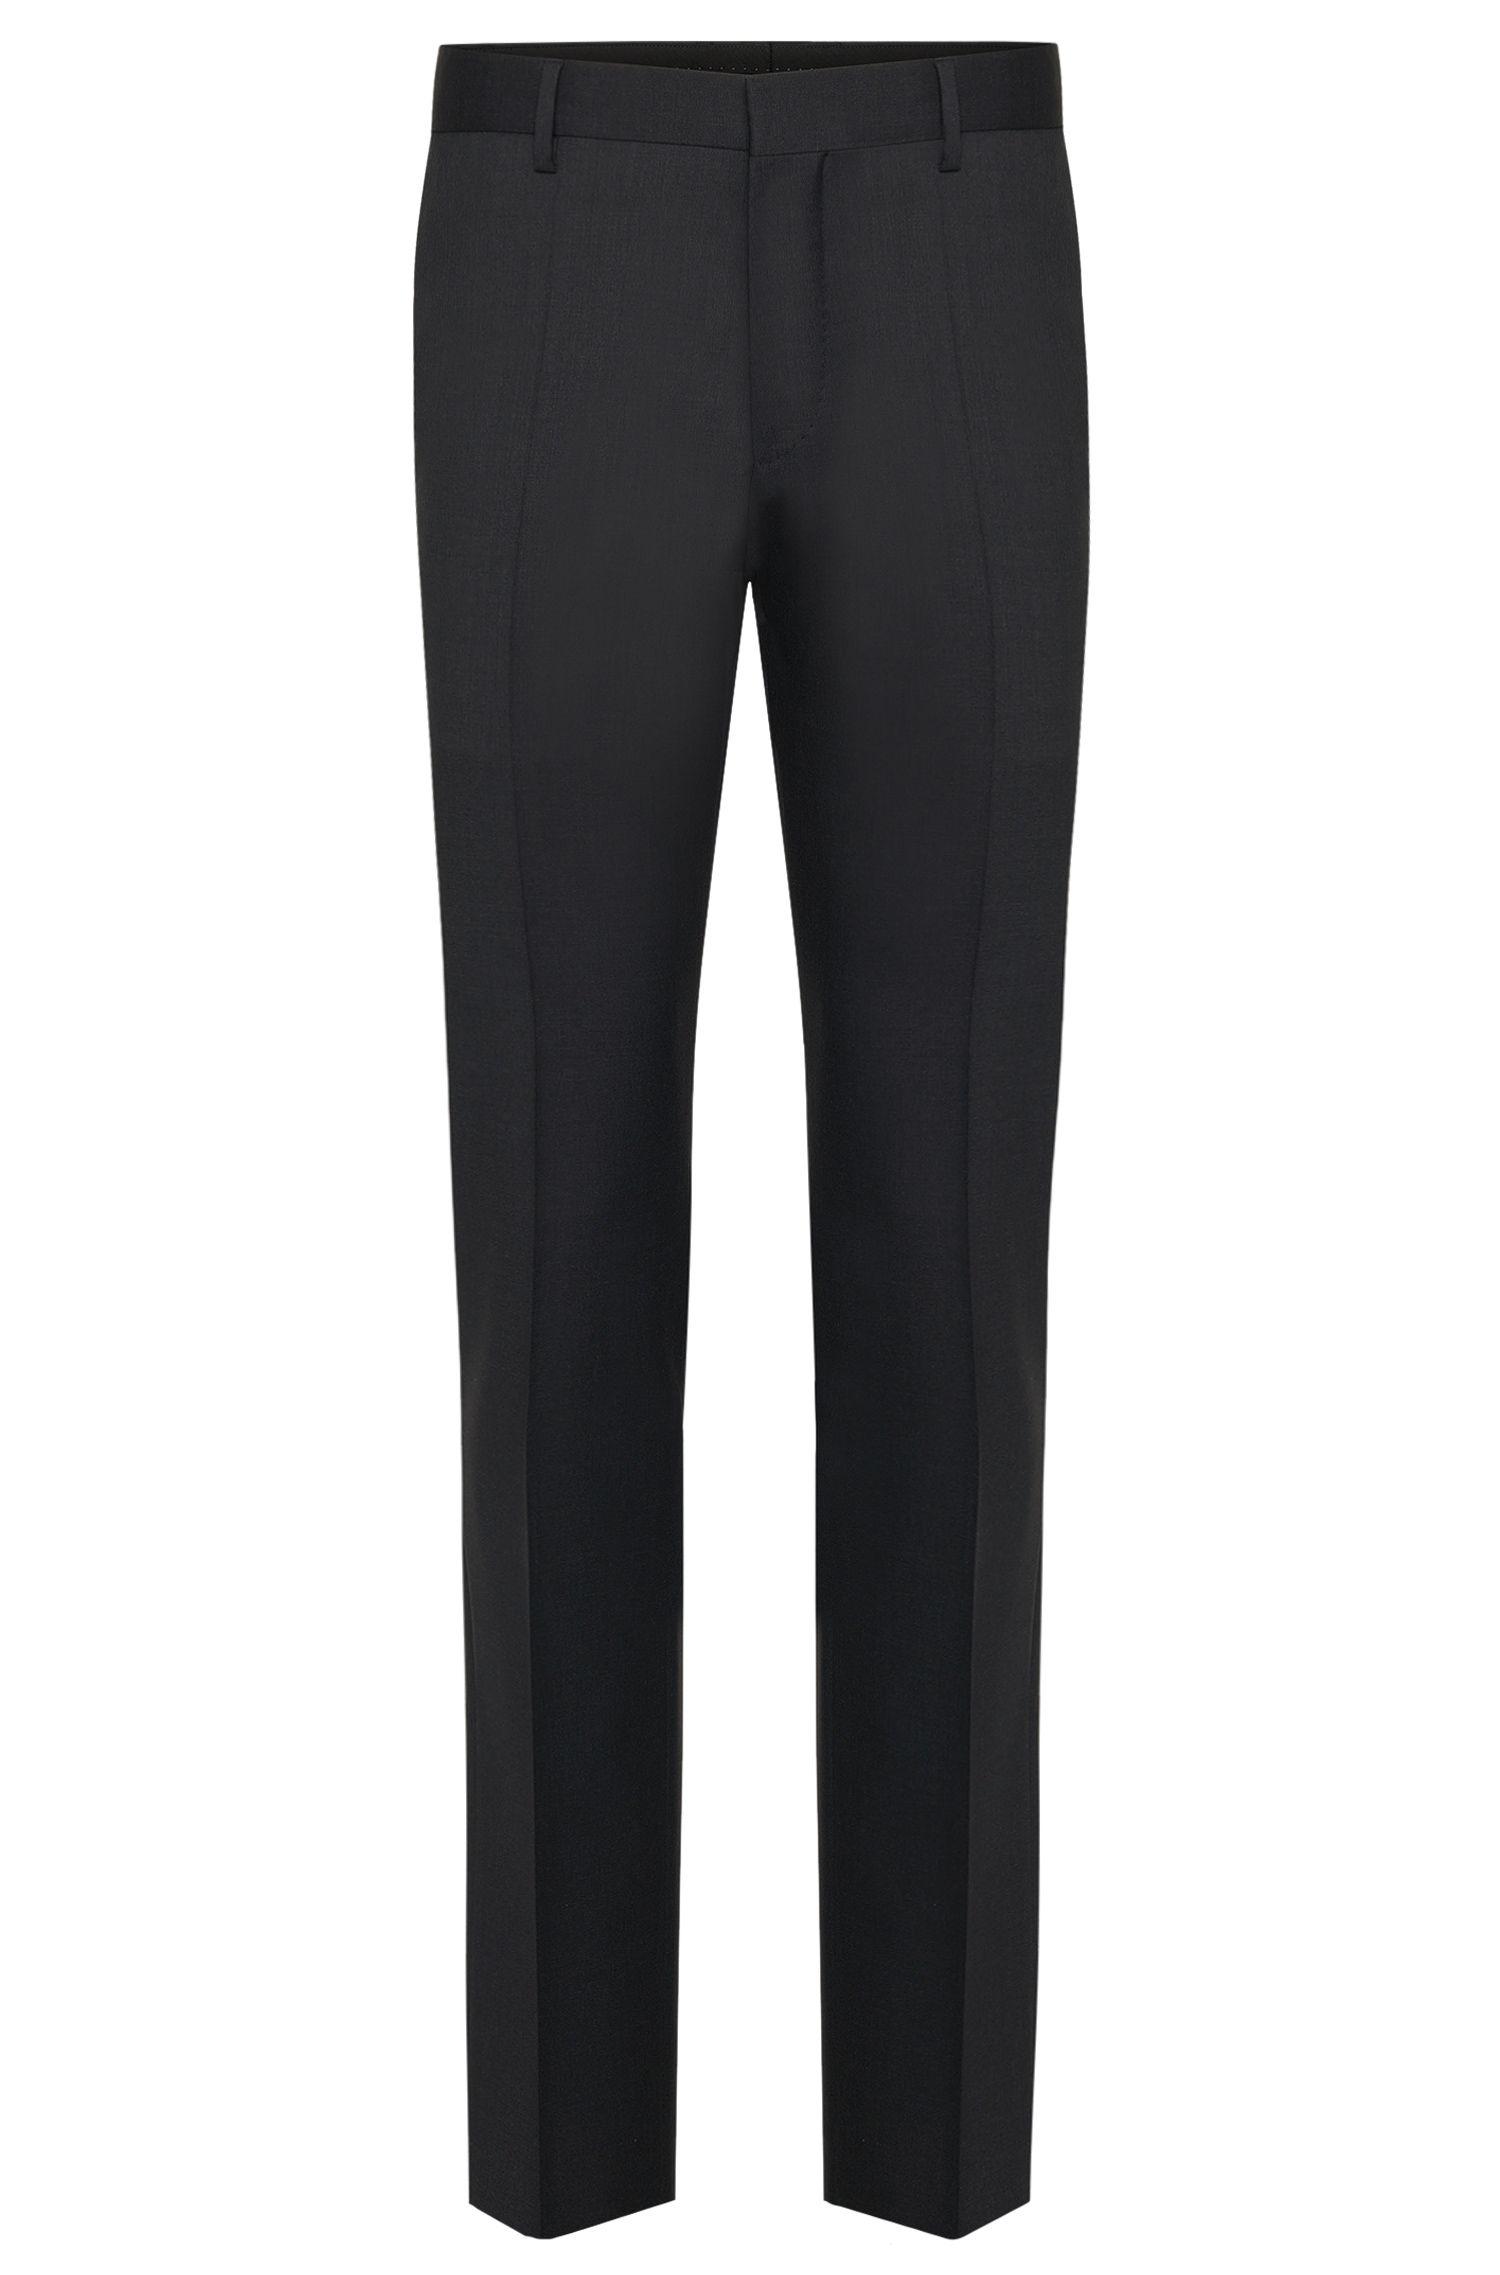 Pantalón liso slim fit de sastrería en pura lana virgen: 'T-Glover1'